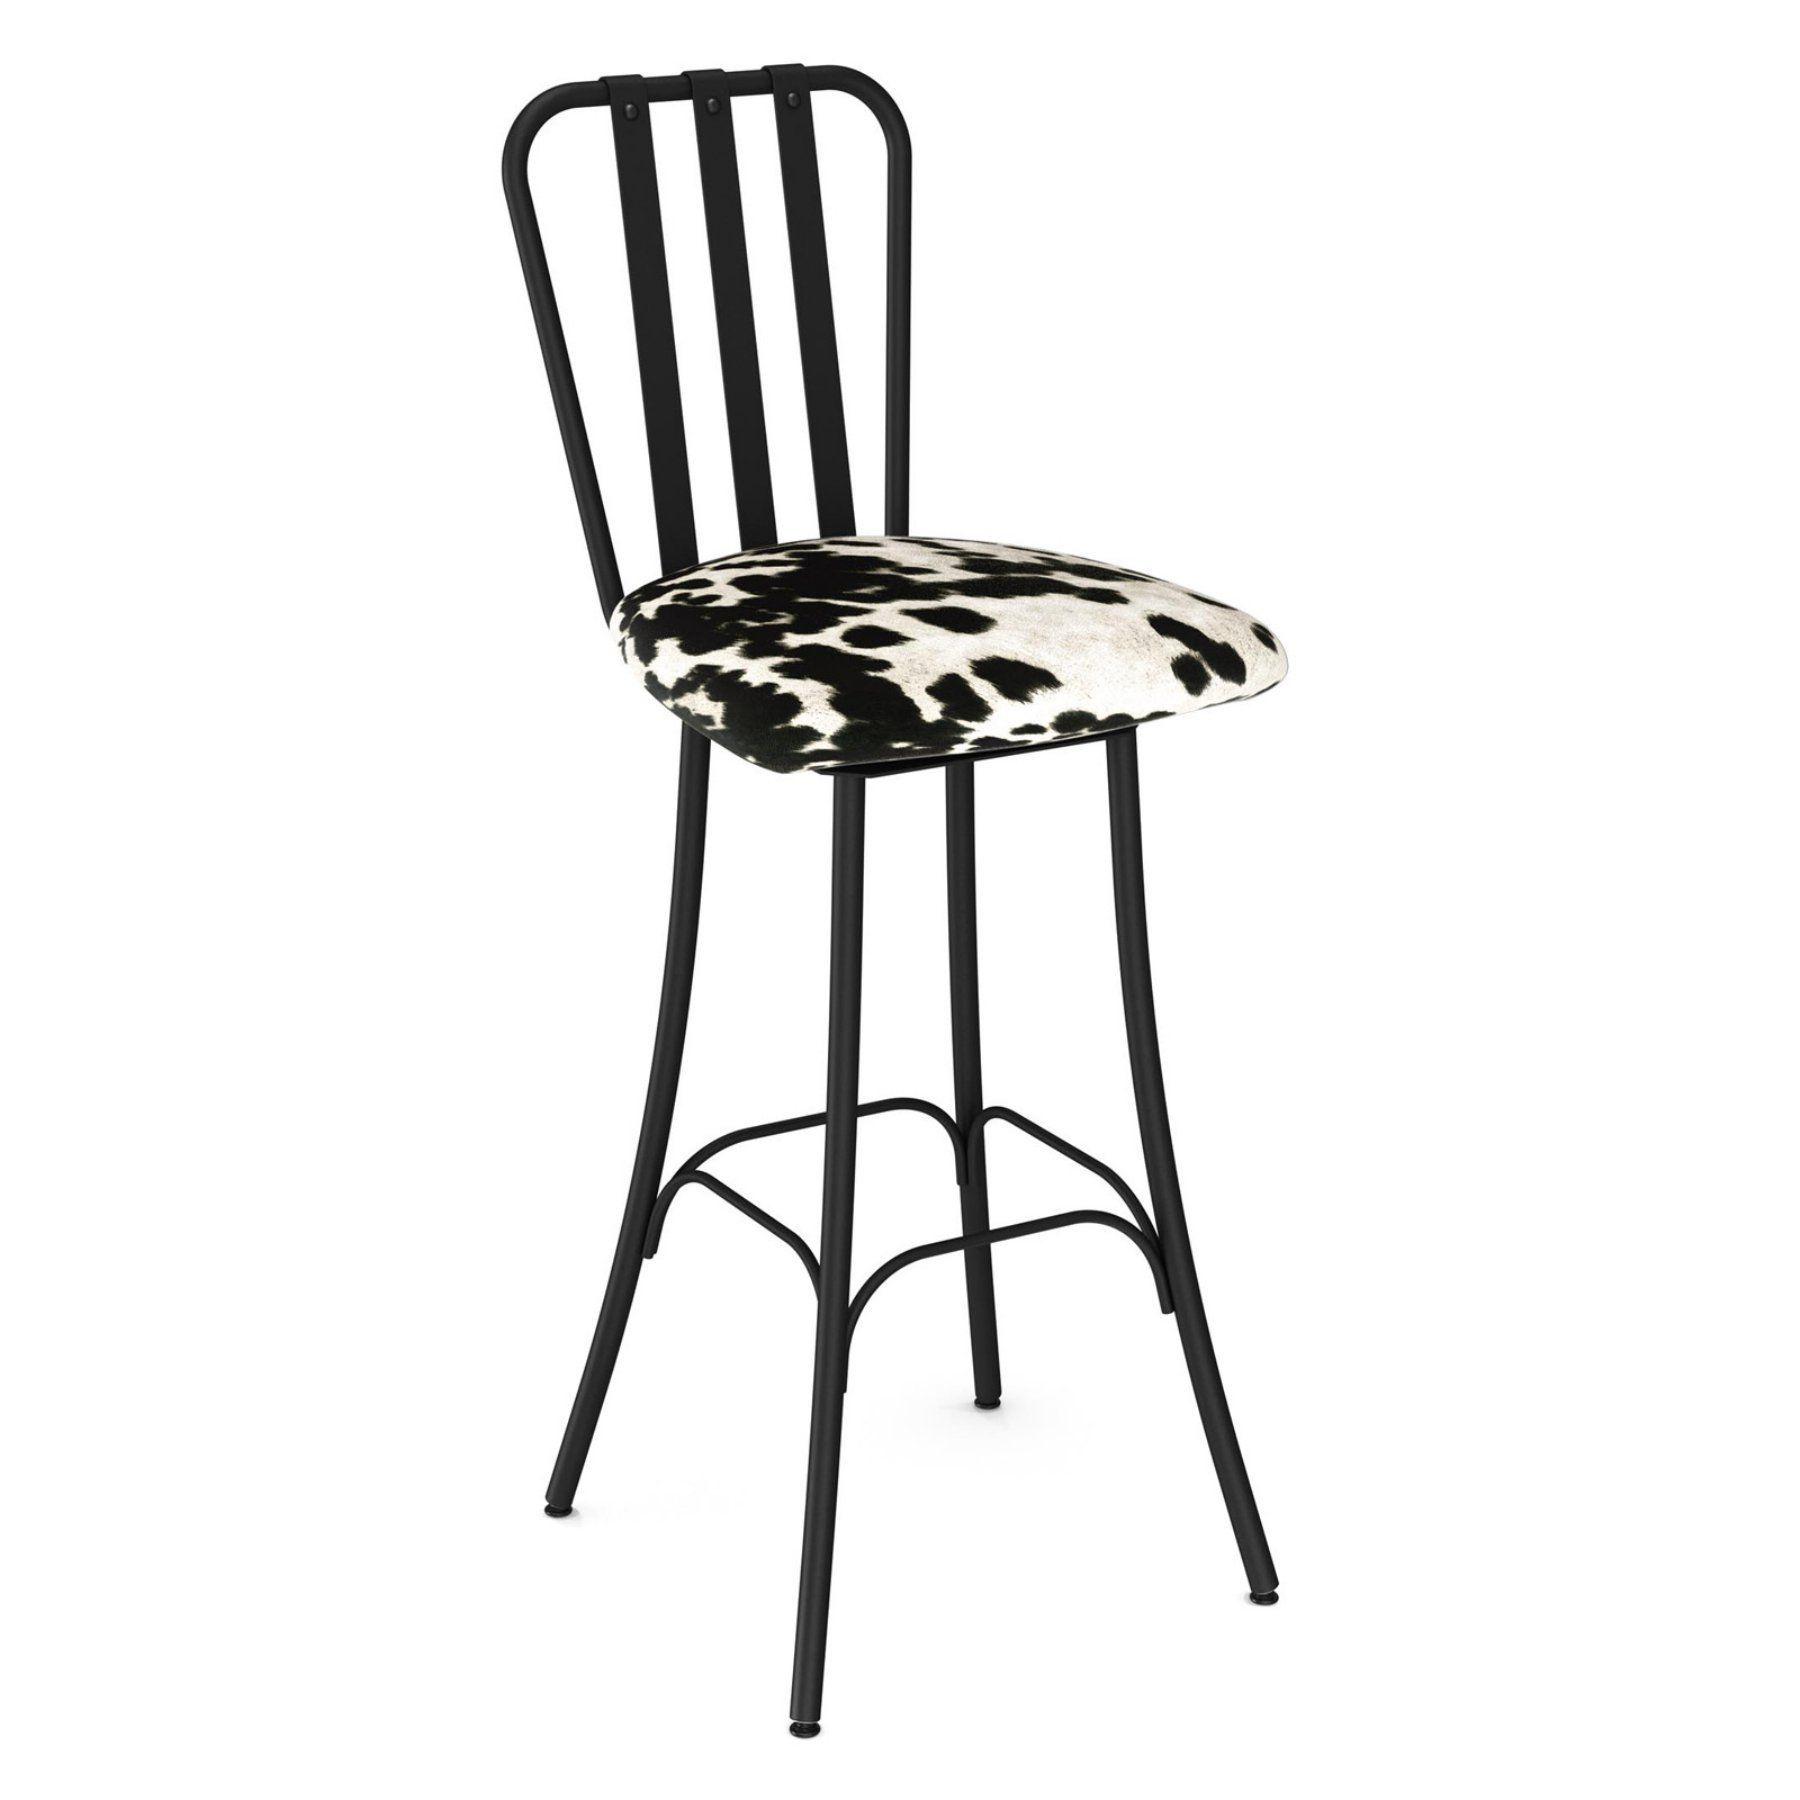 Super Amisco Club 27 In Swivel Counter Stool Light Aqua Blue Creativecarmelina Interior Chair Design Creativecarmelinacom